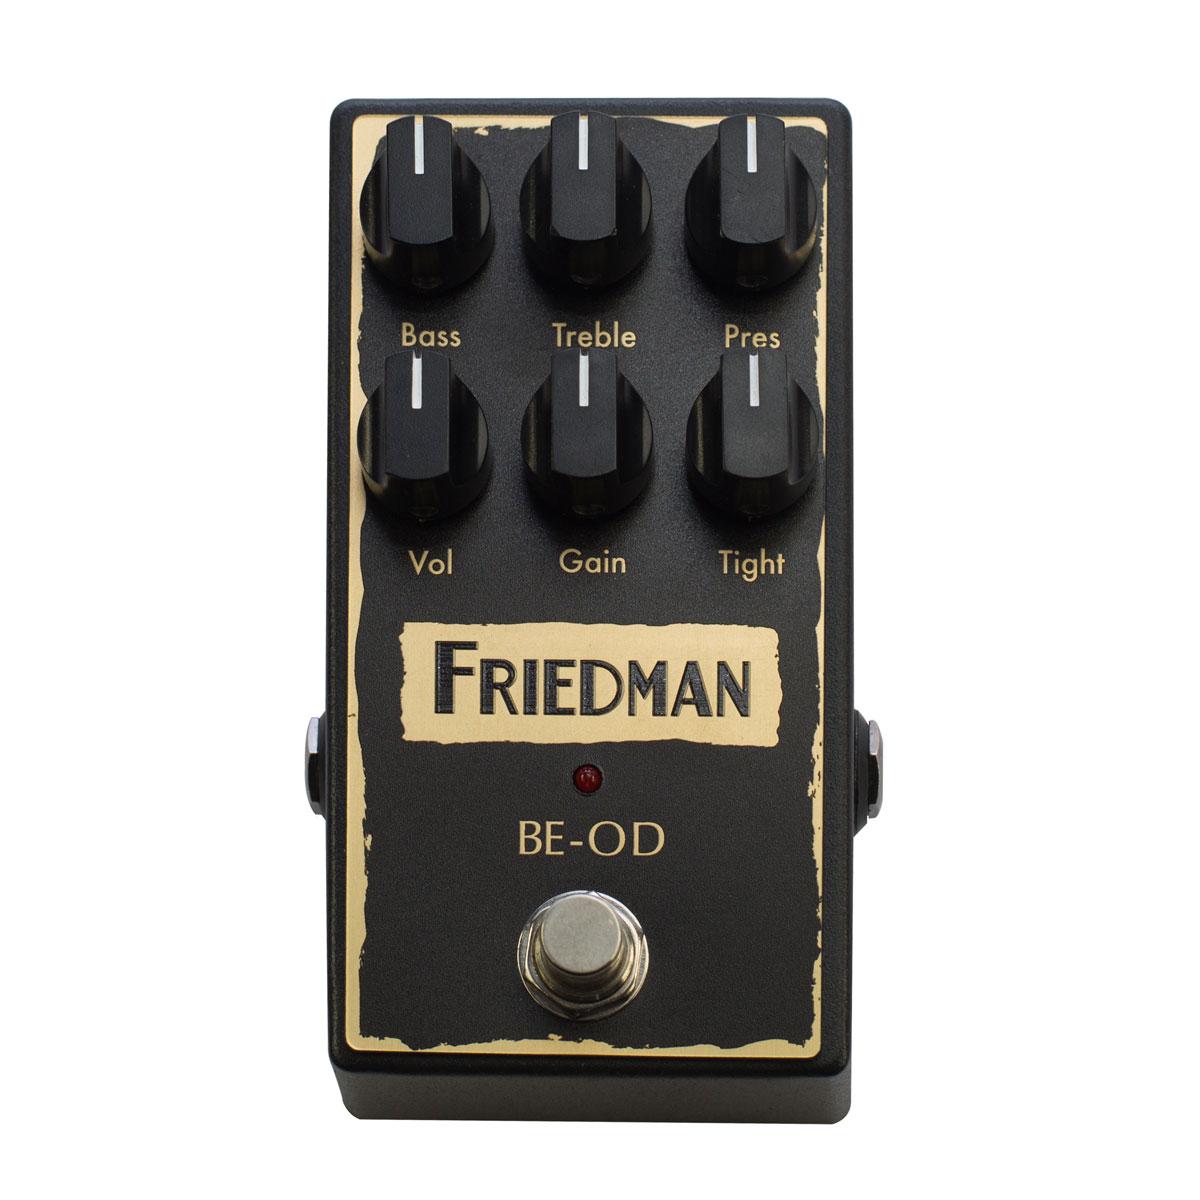 Friedman フリードマン / BE-OD [オーバードライブ]【お取り寄せ商品】【WEBSHOP】